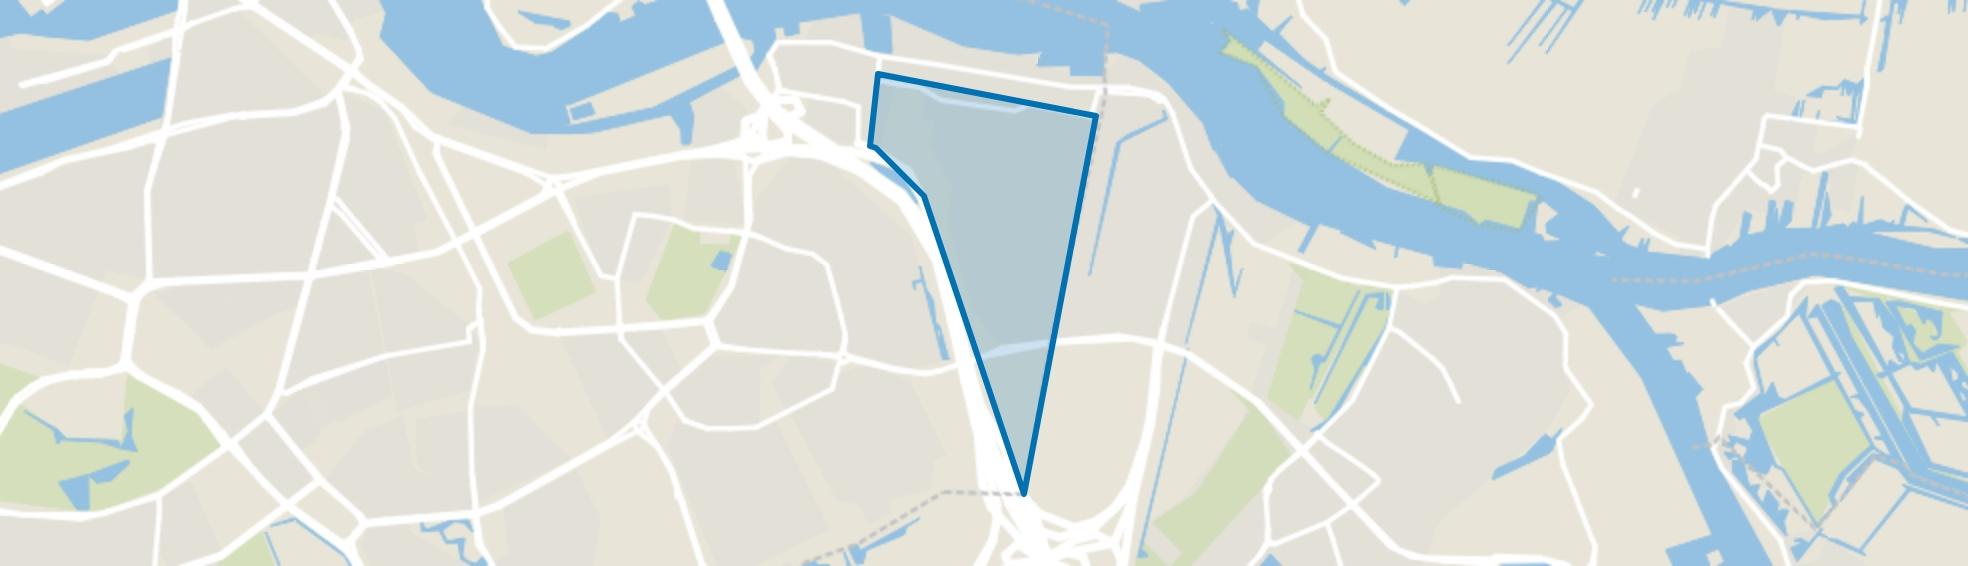 Beverwaard, Rotterdam map